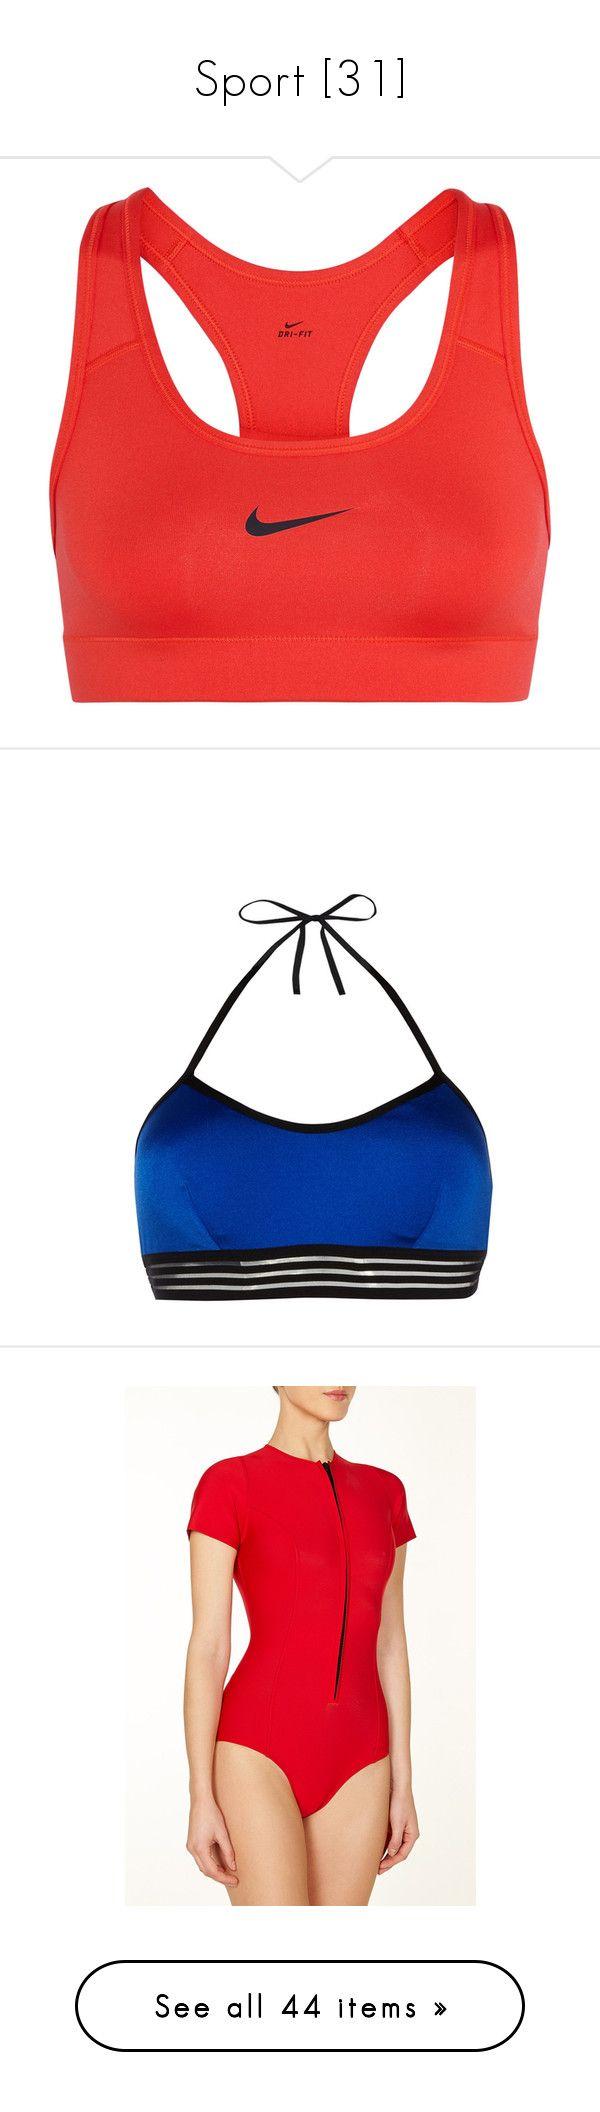 """Sport [31]"" by gdavilla ❤ liked on Polyvore featuring activewear, sports bras, sports bra, bras, nike, tops, red sports bra, stretch jersey, nike sportswear and racer back sports bra"